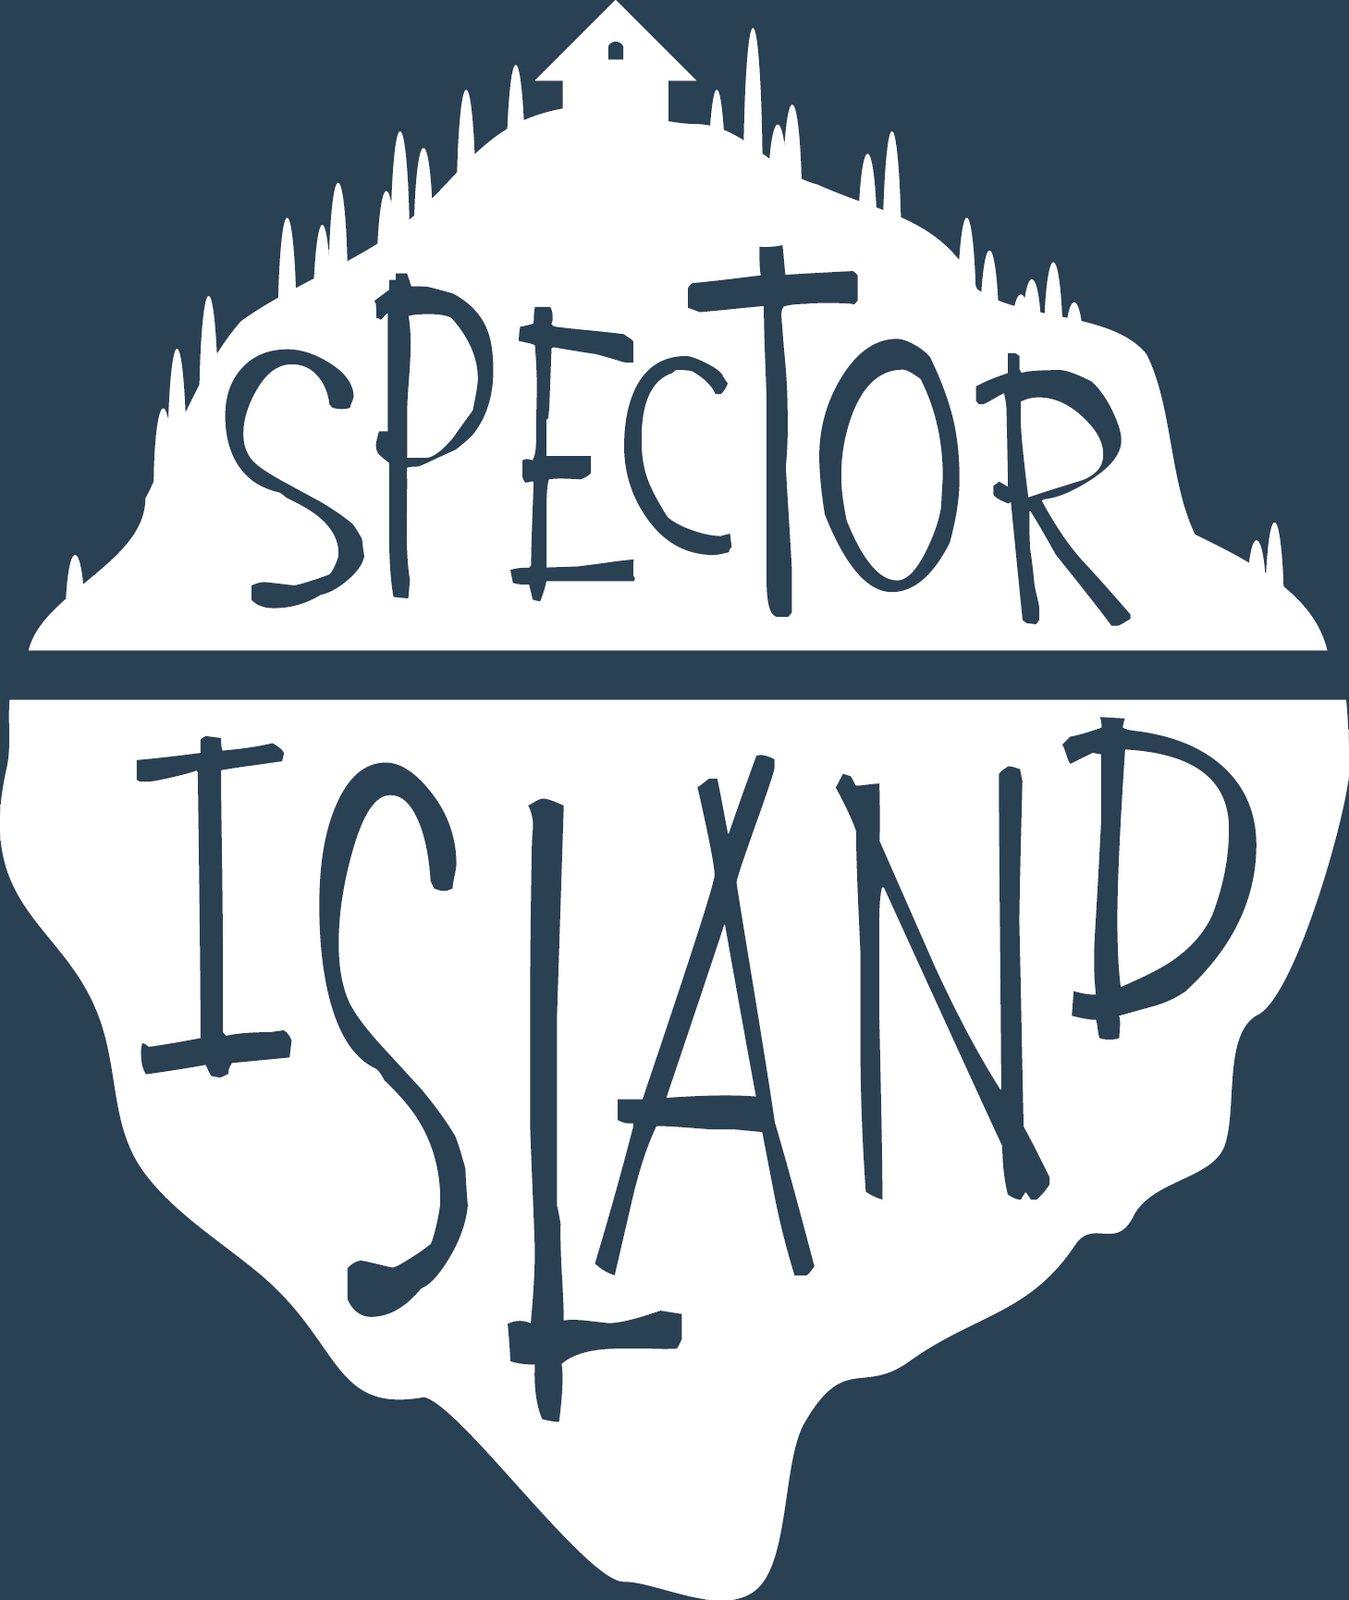 Spector Island